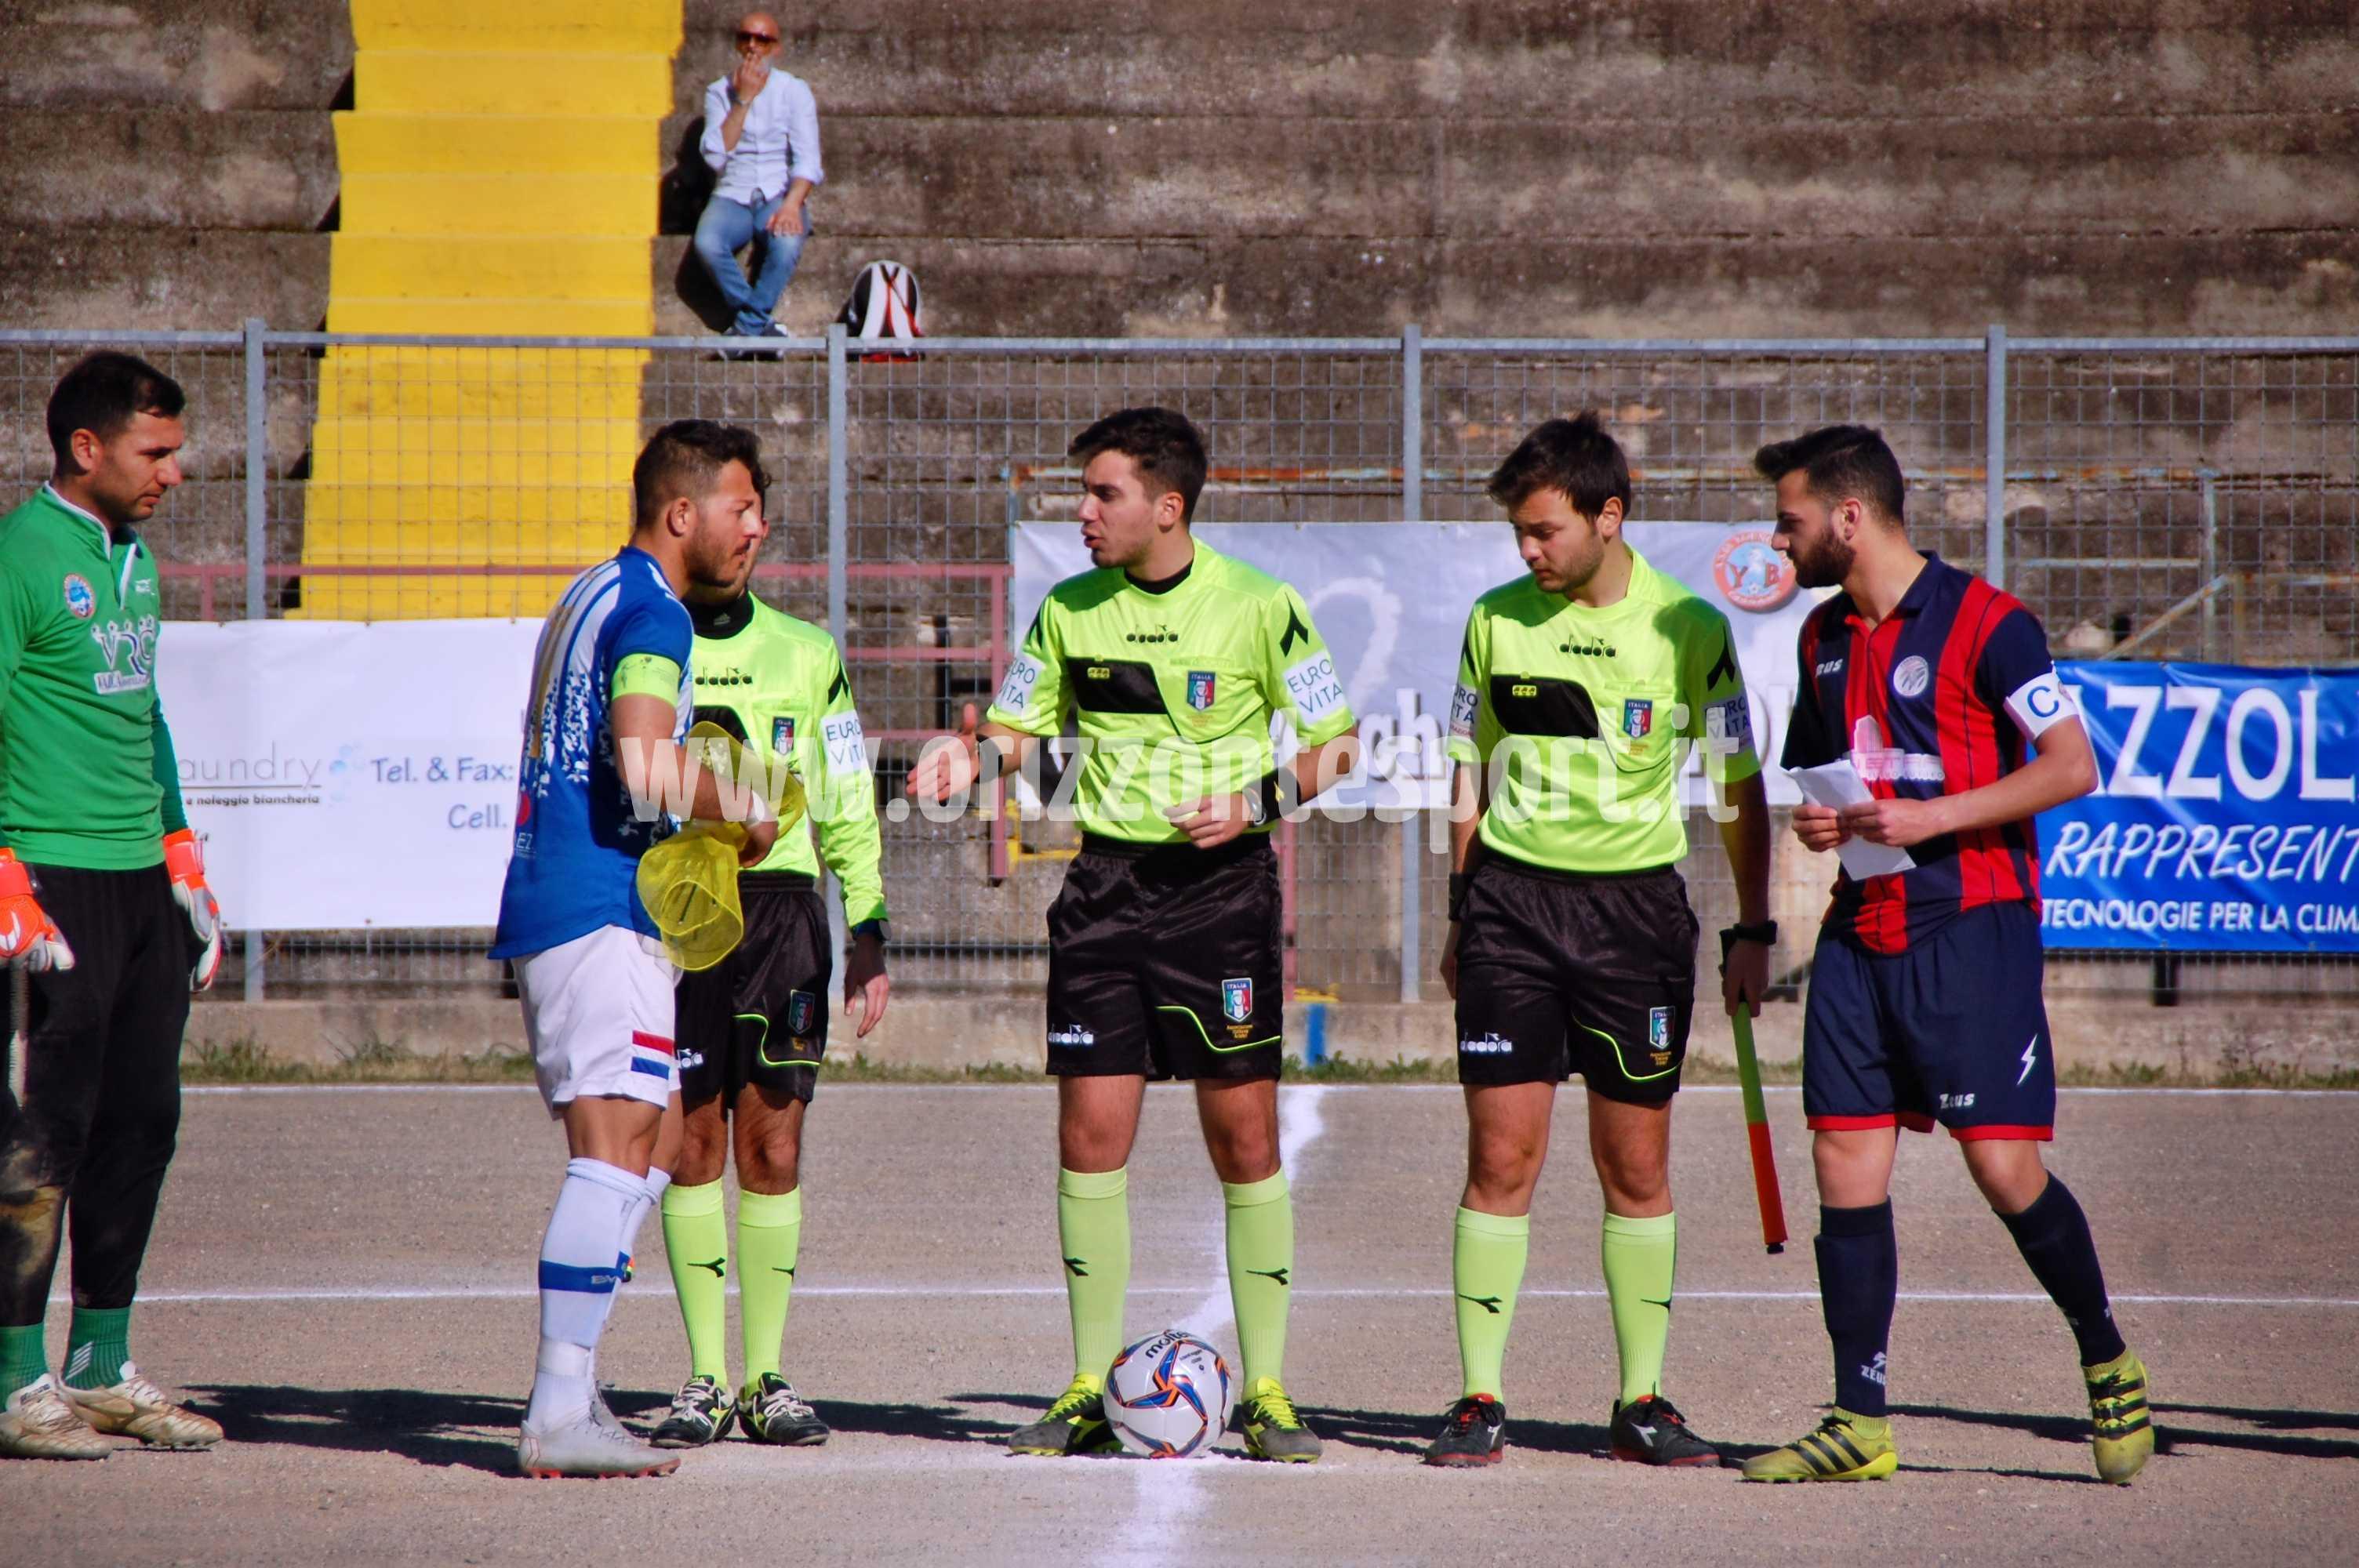 cassano_rossanese (9)